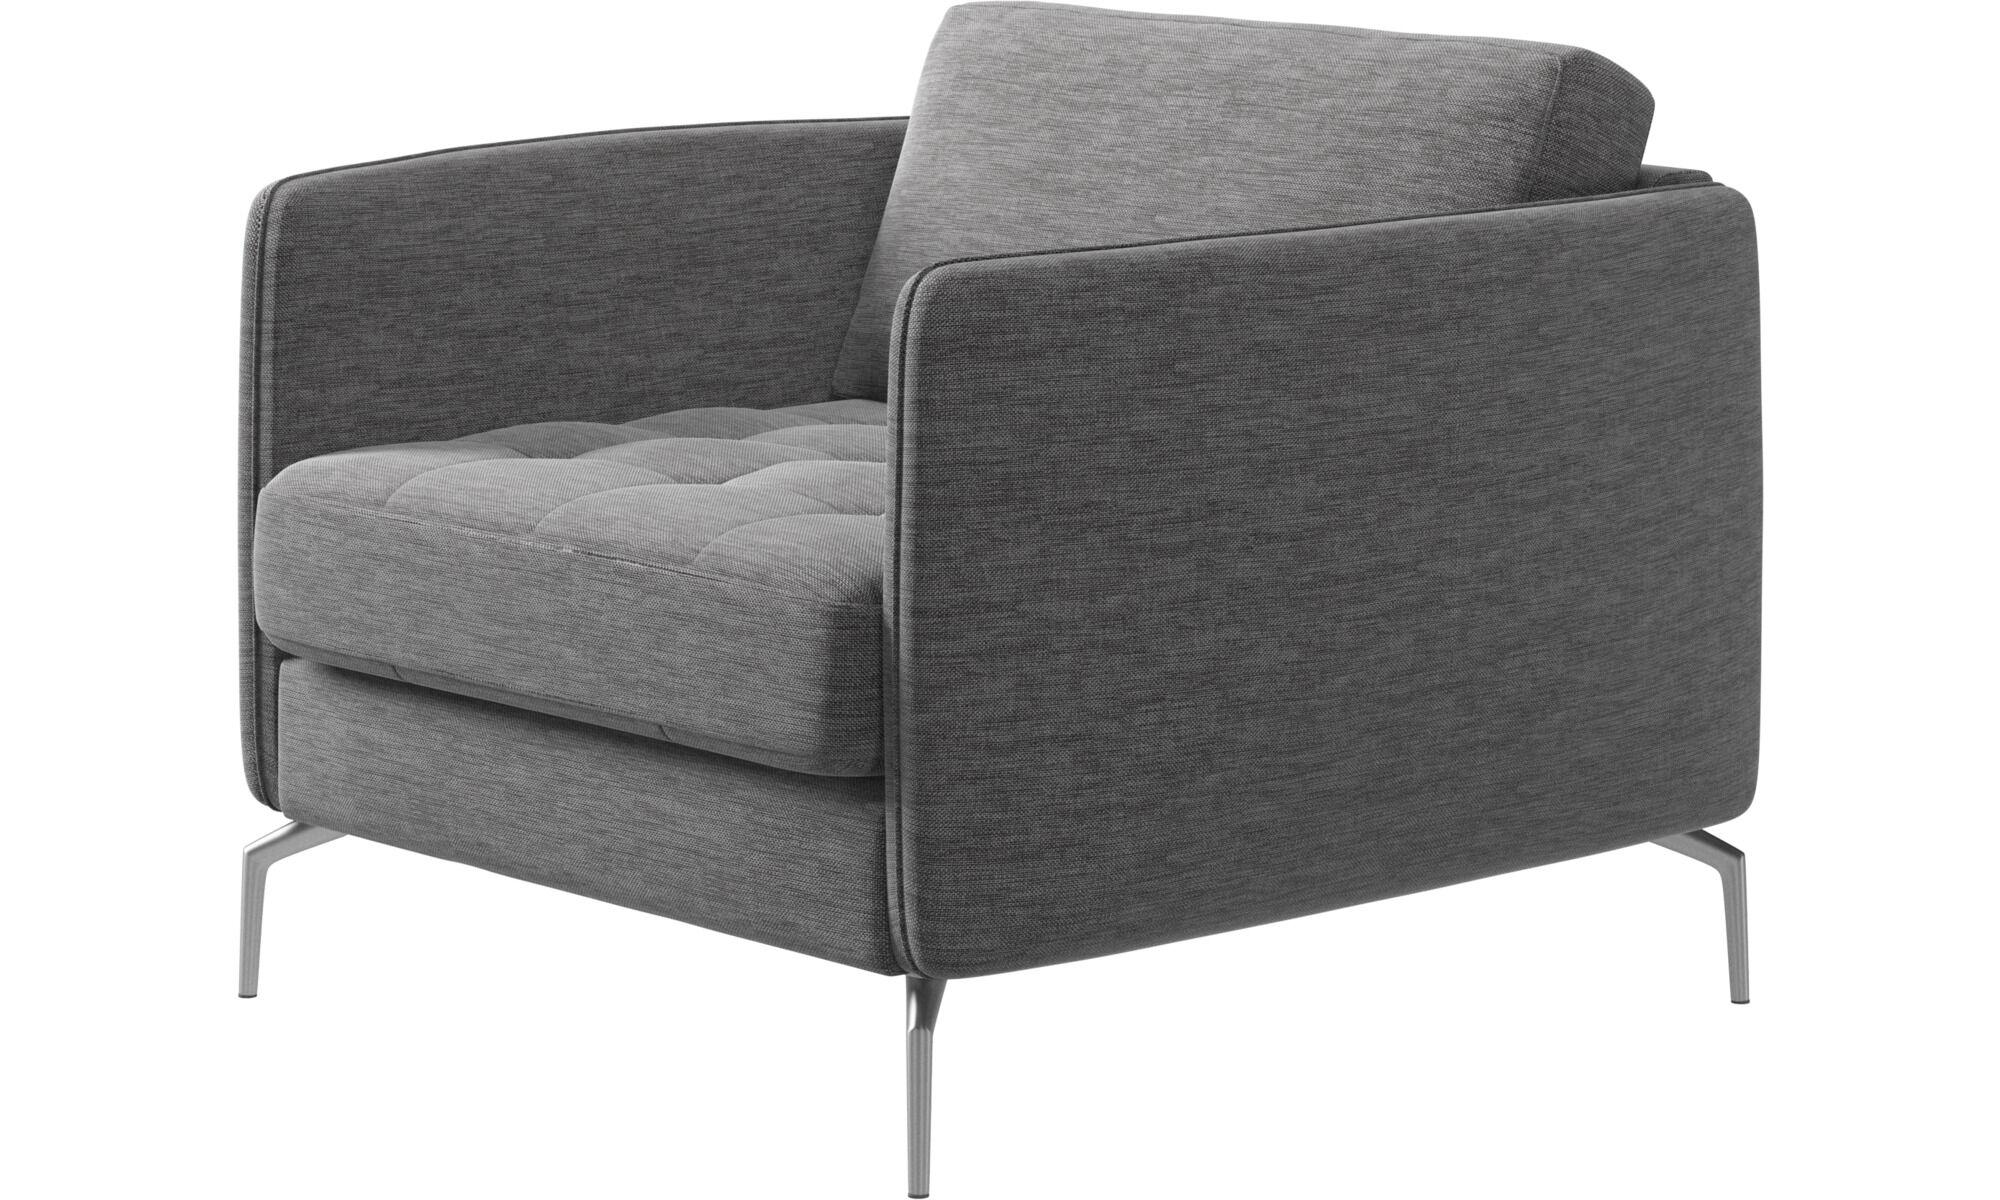 Armchairs   Osaka Chair, Tufted Seat   Gray   Fabric